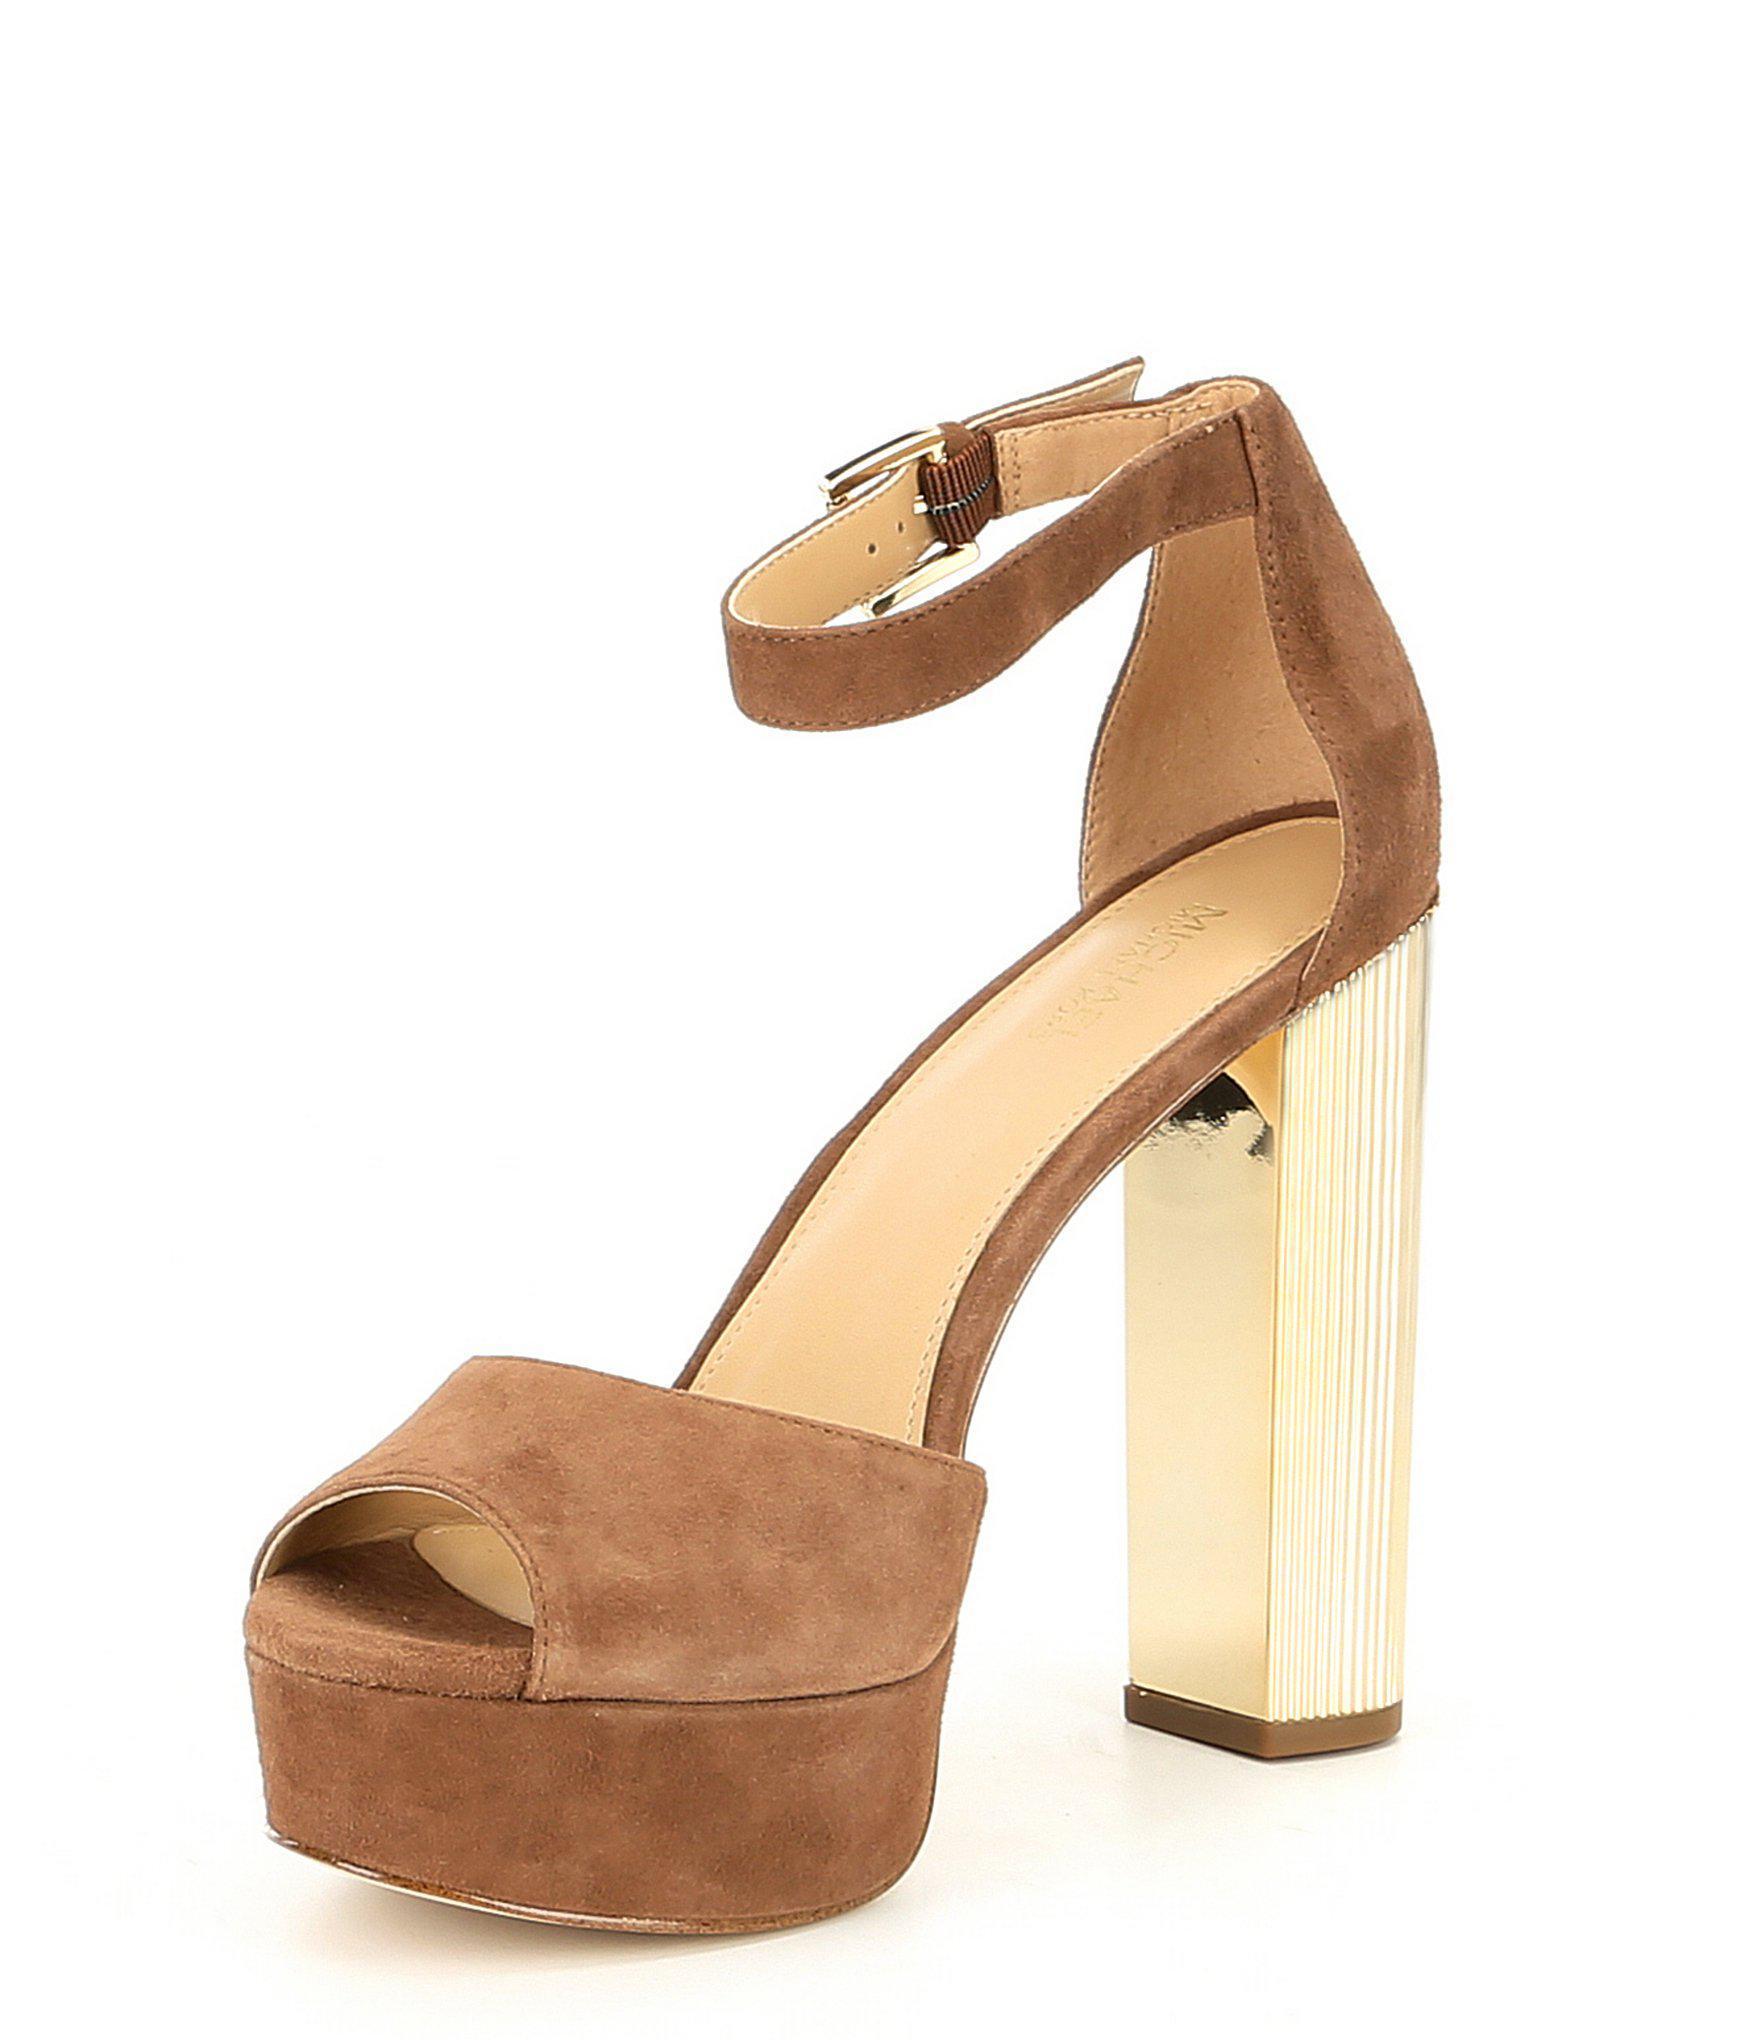 a4ead65dbd9e MICHAEL Michael Kors Paloma Suede Ankle Strap Platform Block Heel ...